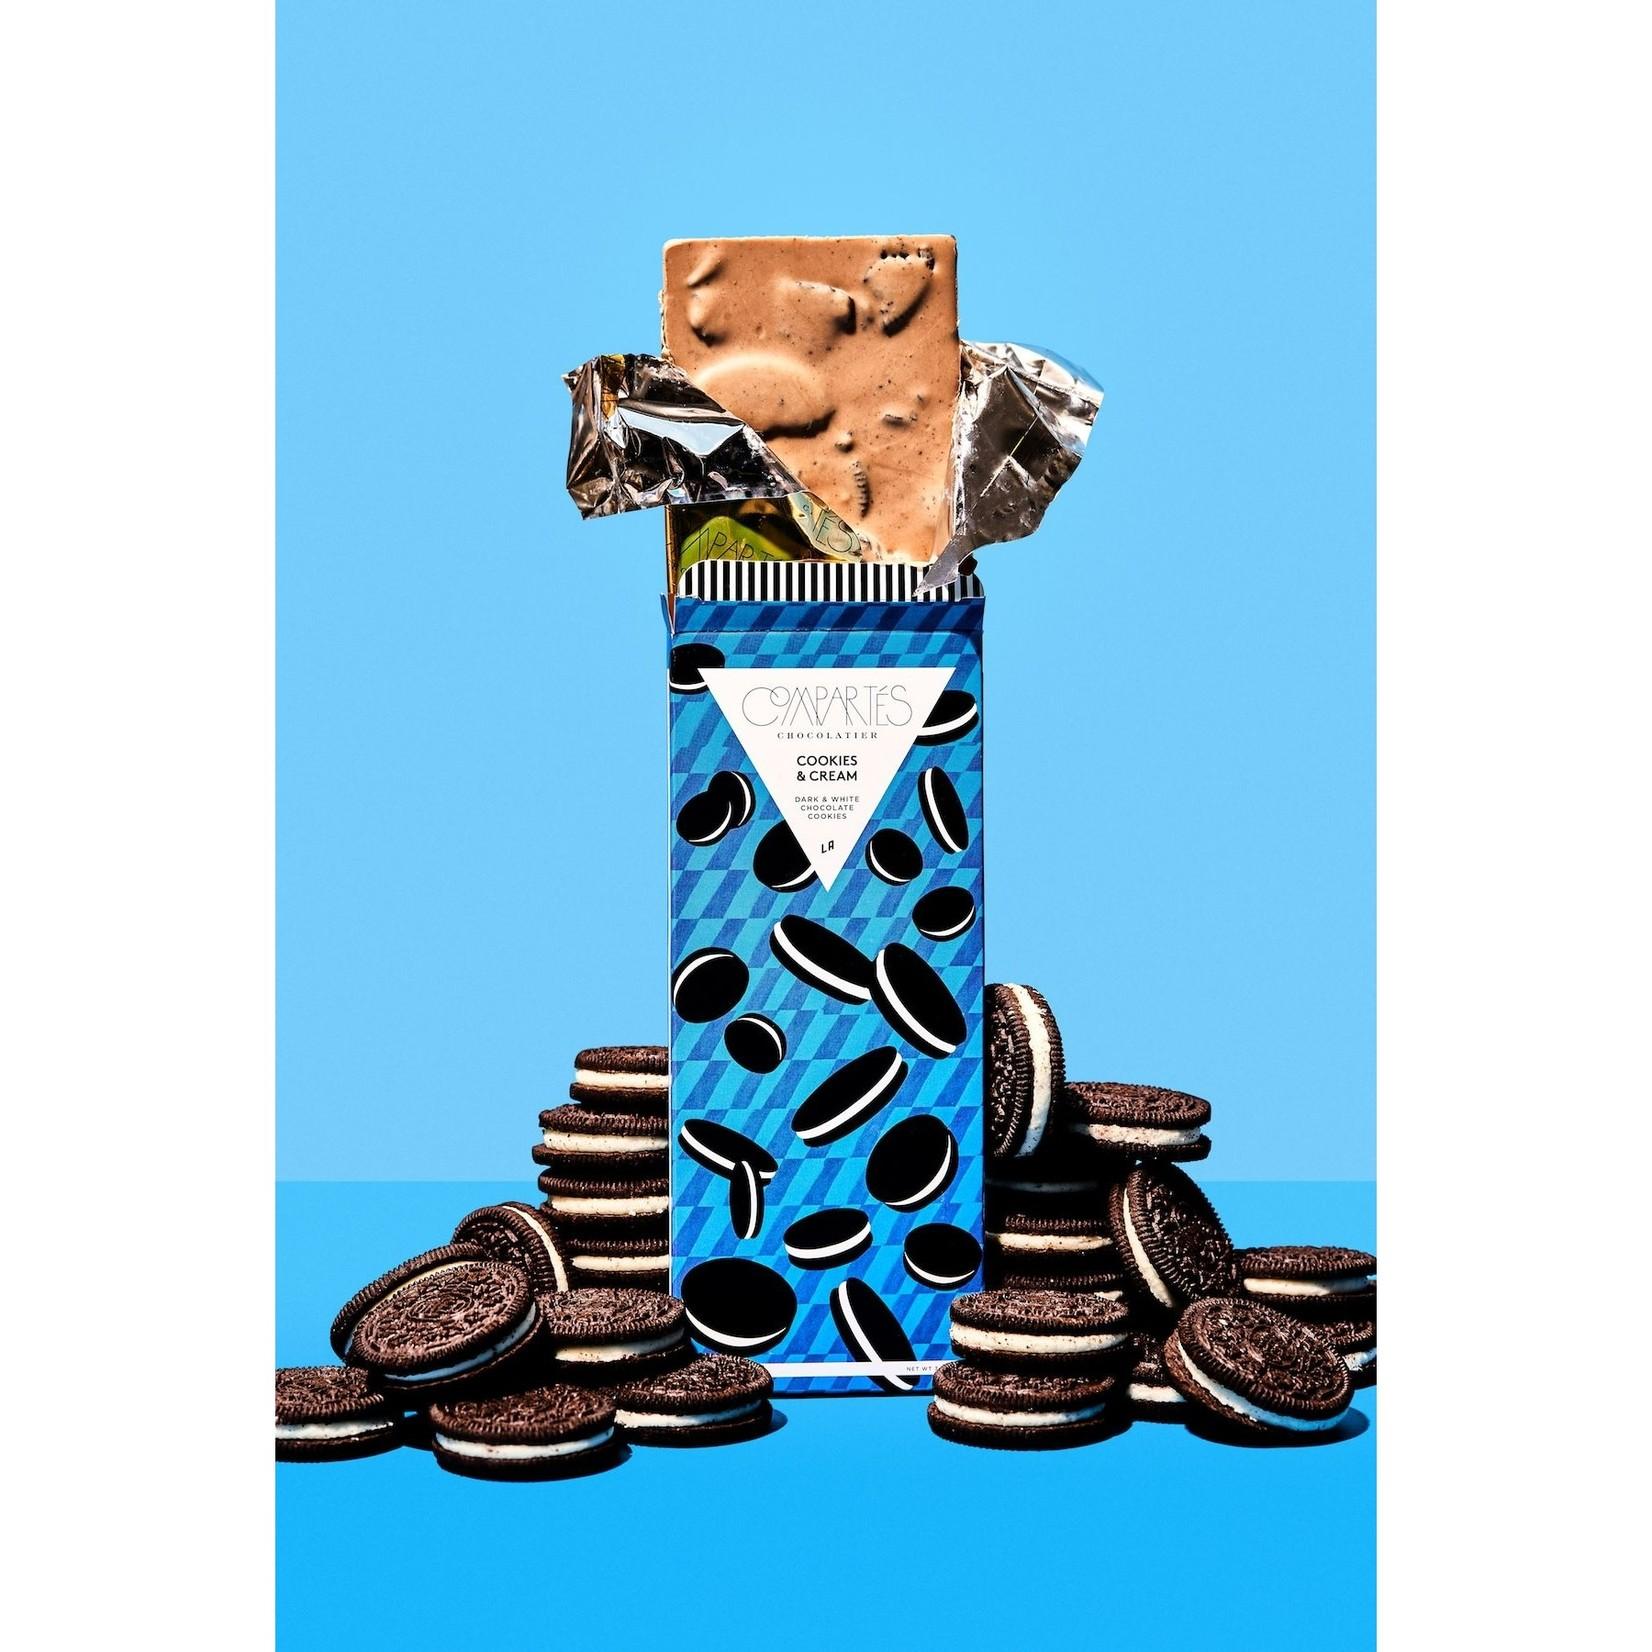 Compartes Chocolate Compartes Chocolate Cookies and Cream Oreo Cookie Chocolate Bar